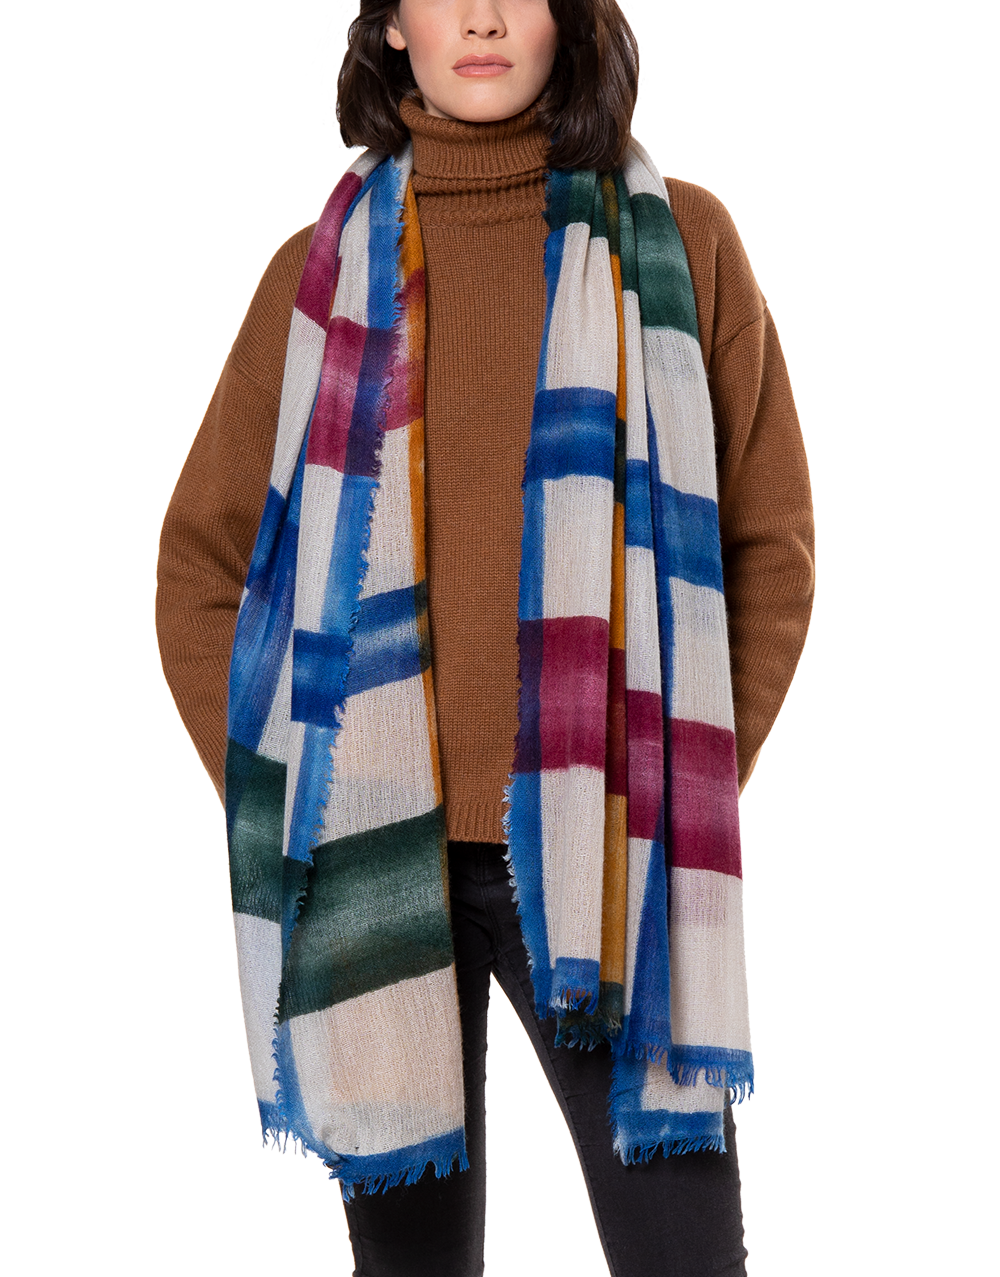 Freddie scarf blue ocre green beige square